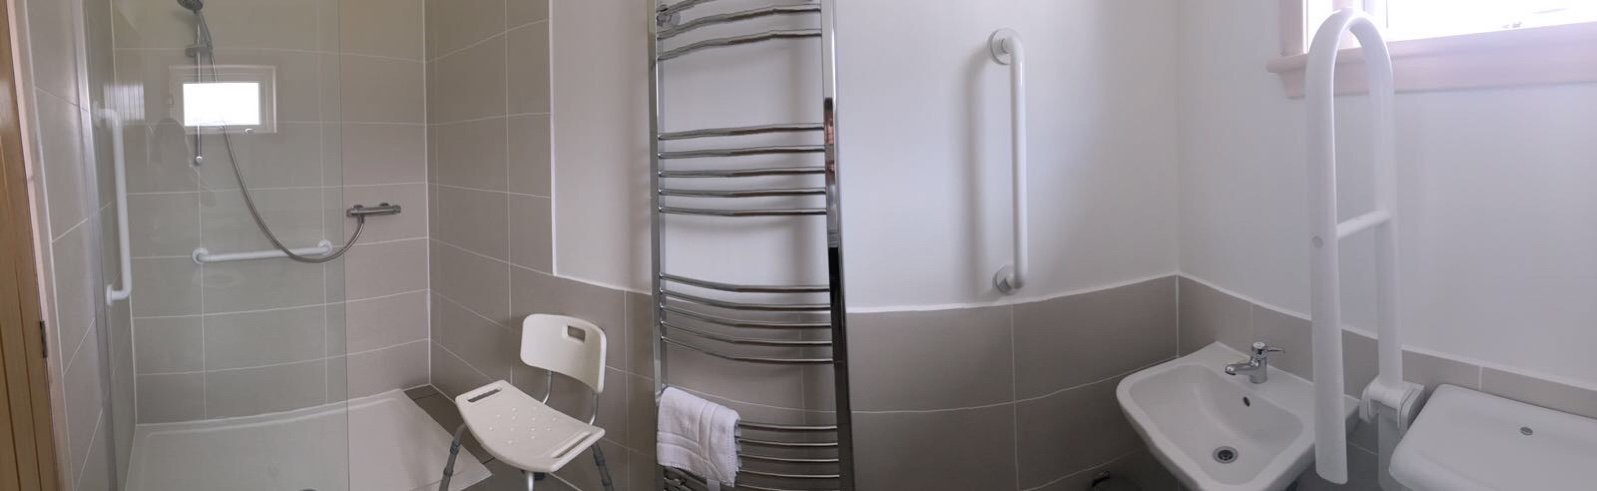 Accessible ensuite bathroom (downstairs)